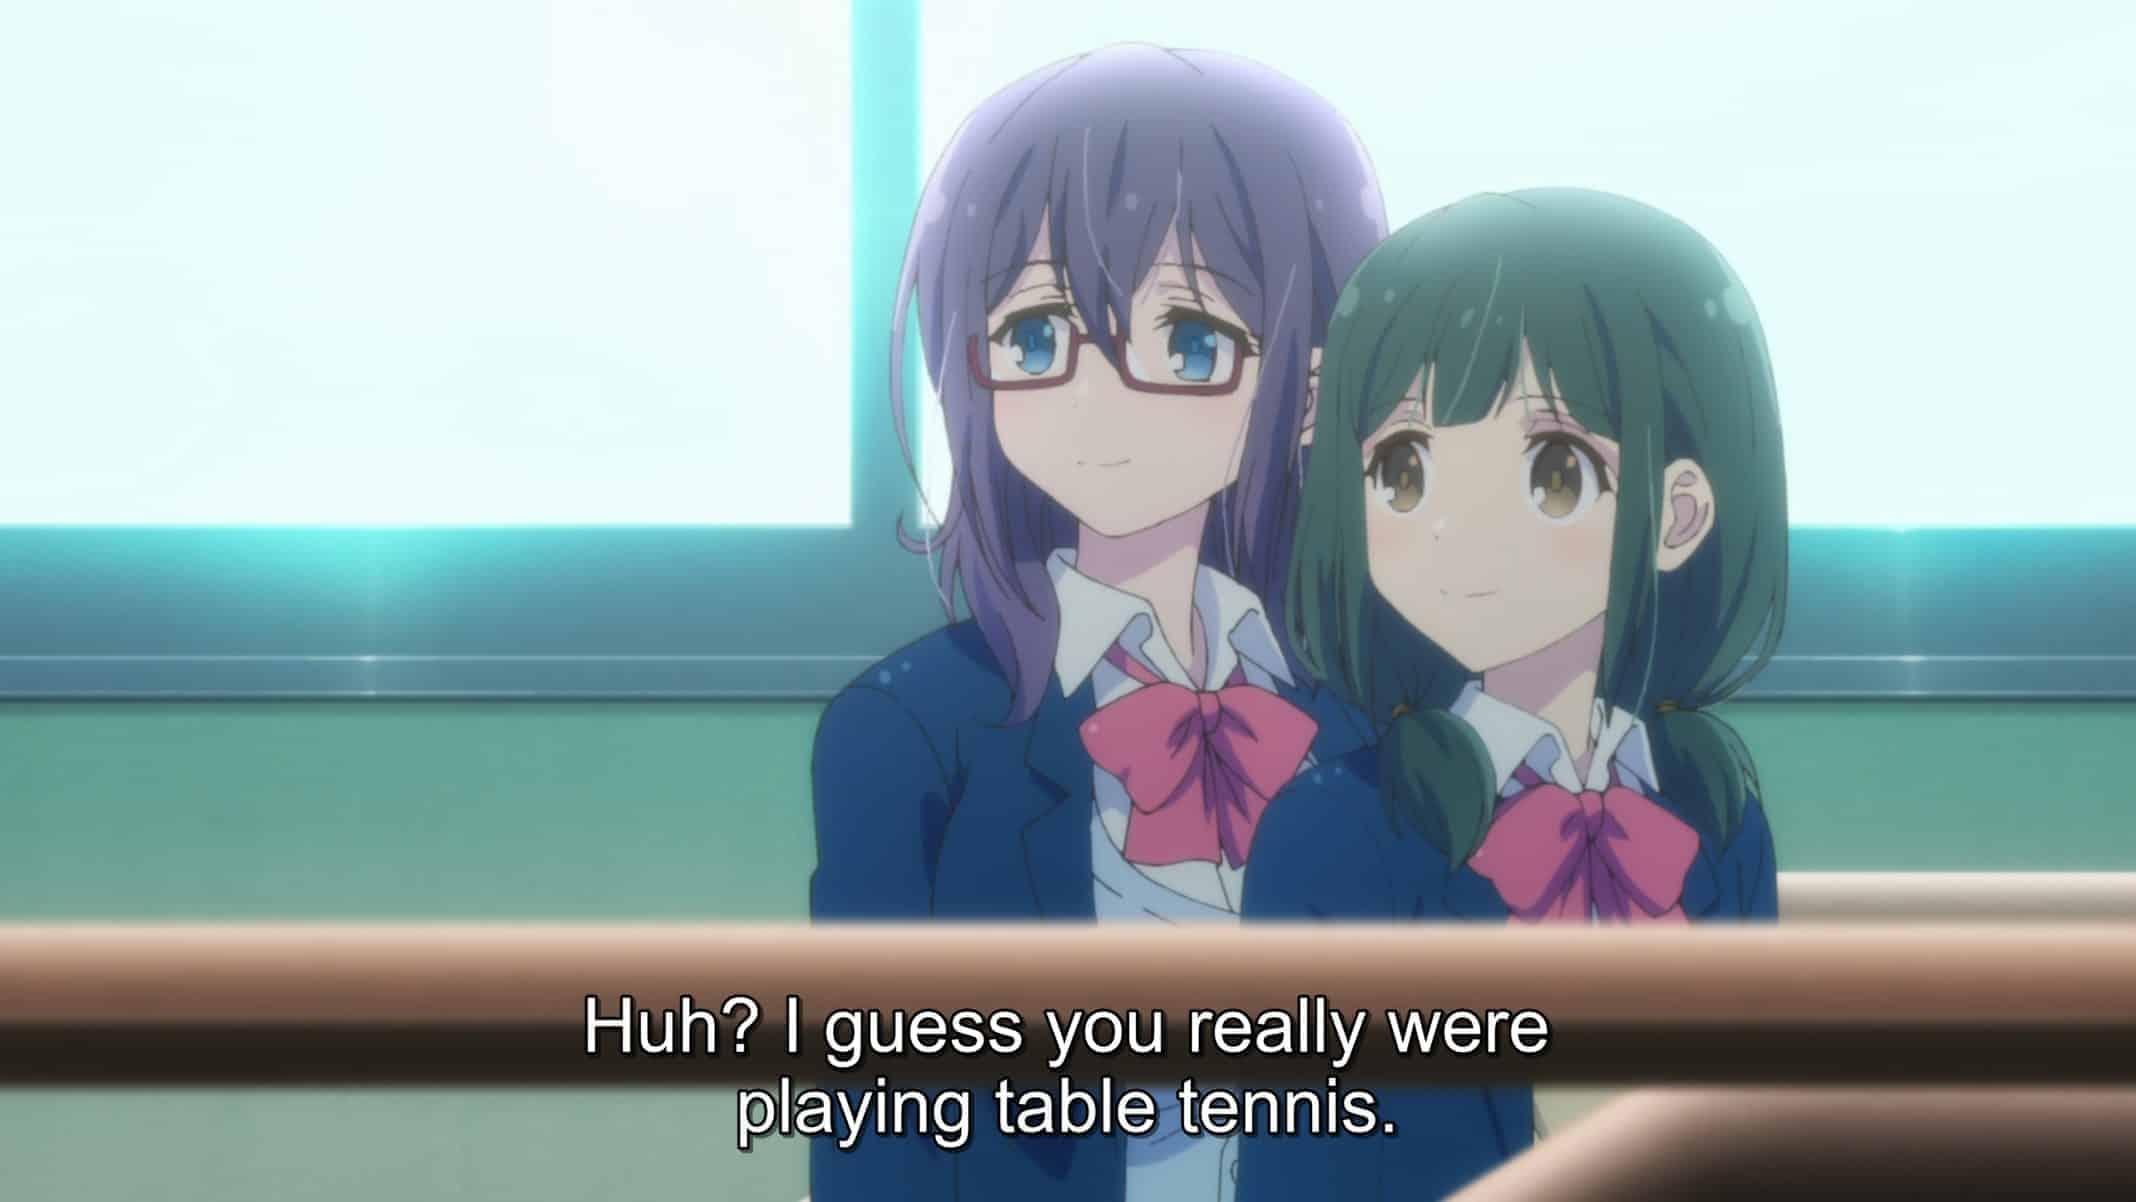 Nagafuji (Ueda Reina) and Hino (Numakura Manami) learning about Adachi and Shimamura's friendship.